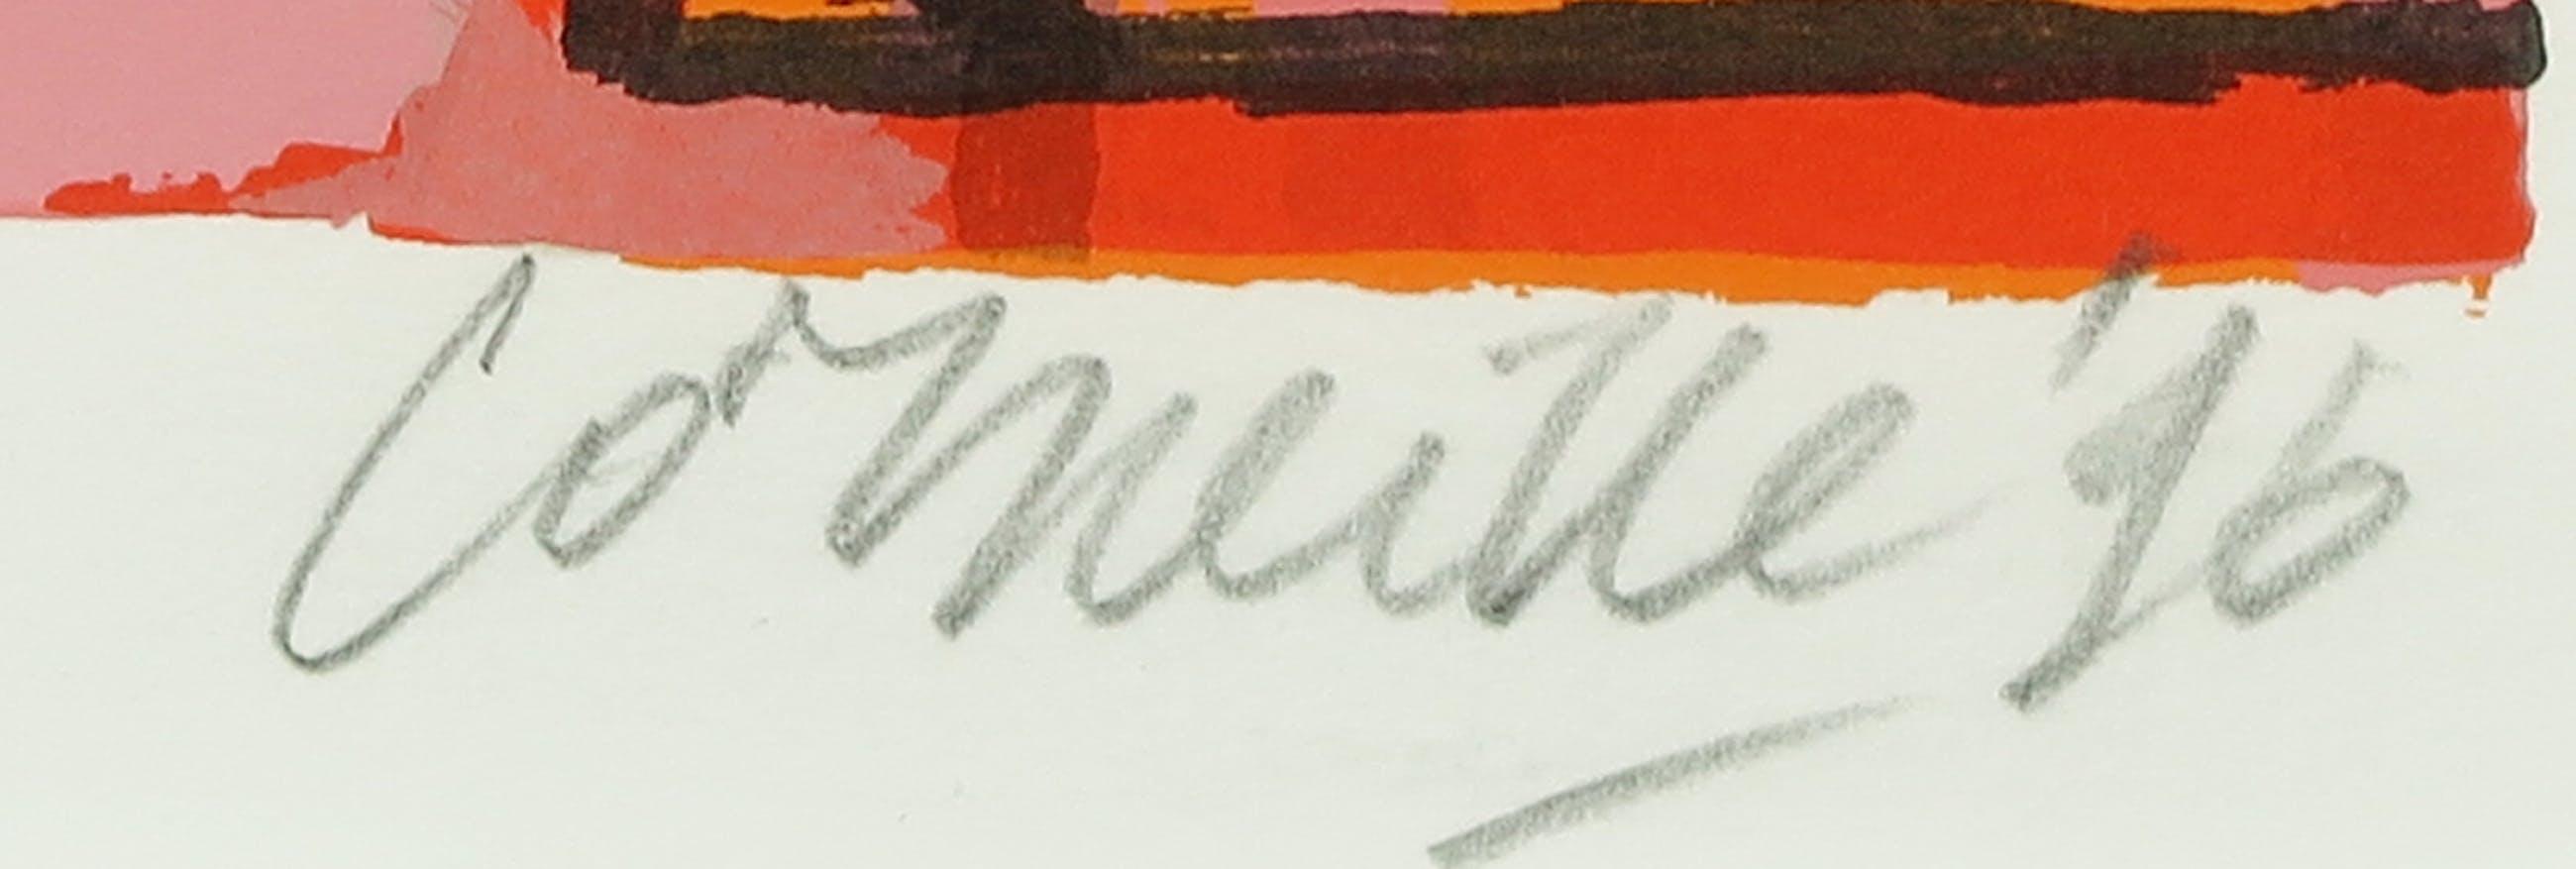 Corneille - Zeefdruk, Femme Orange et L'oiseau Jaune - Ingelijst kopen? Bied vanaf 150!